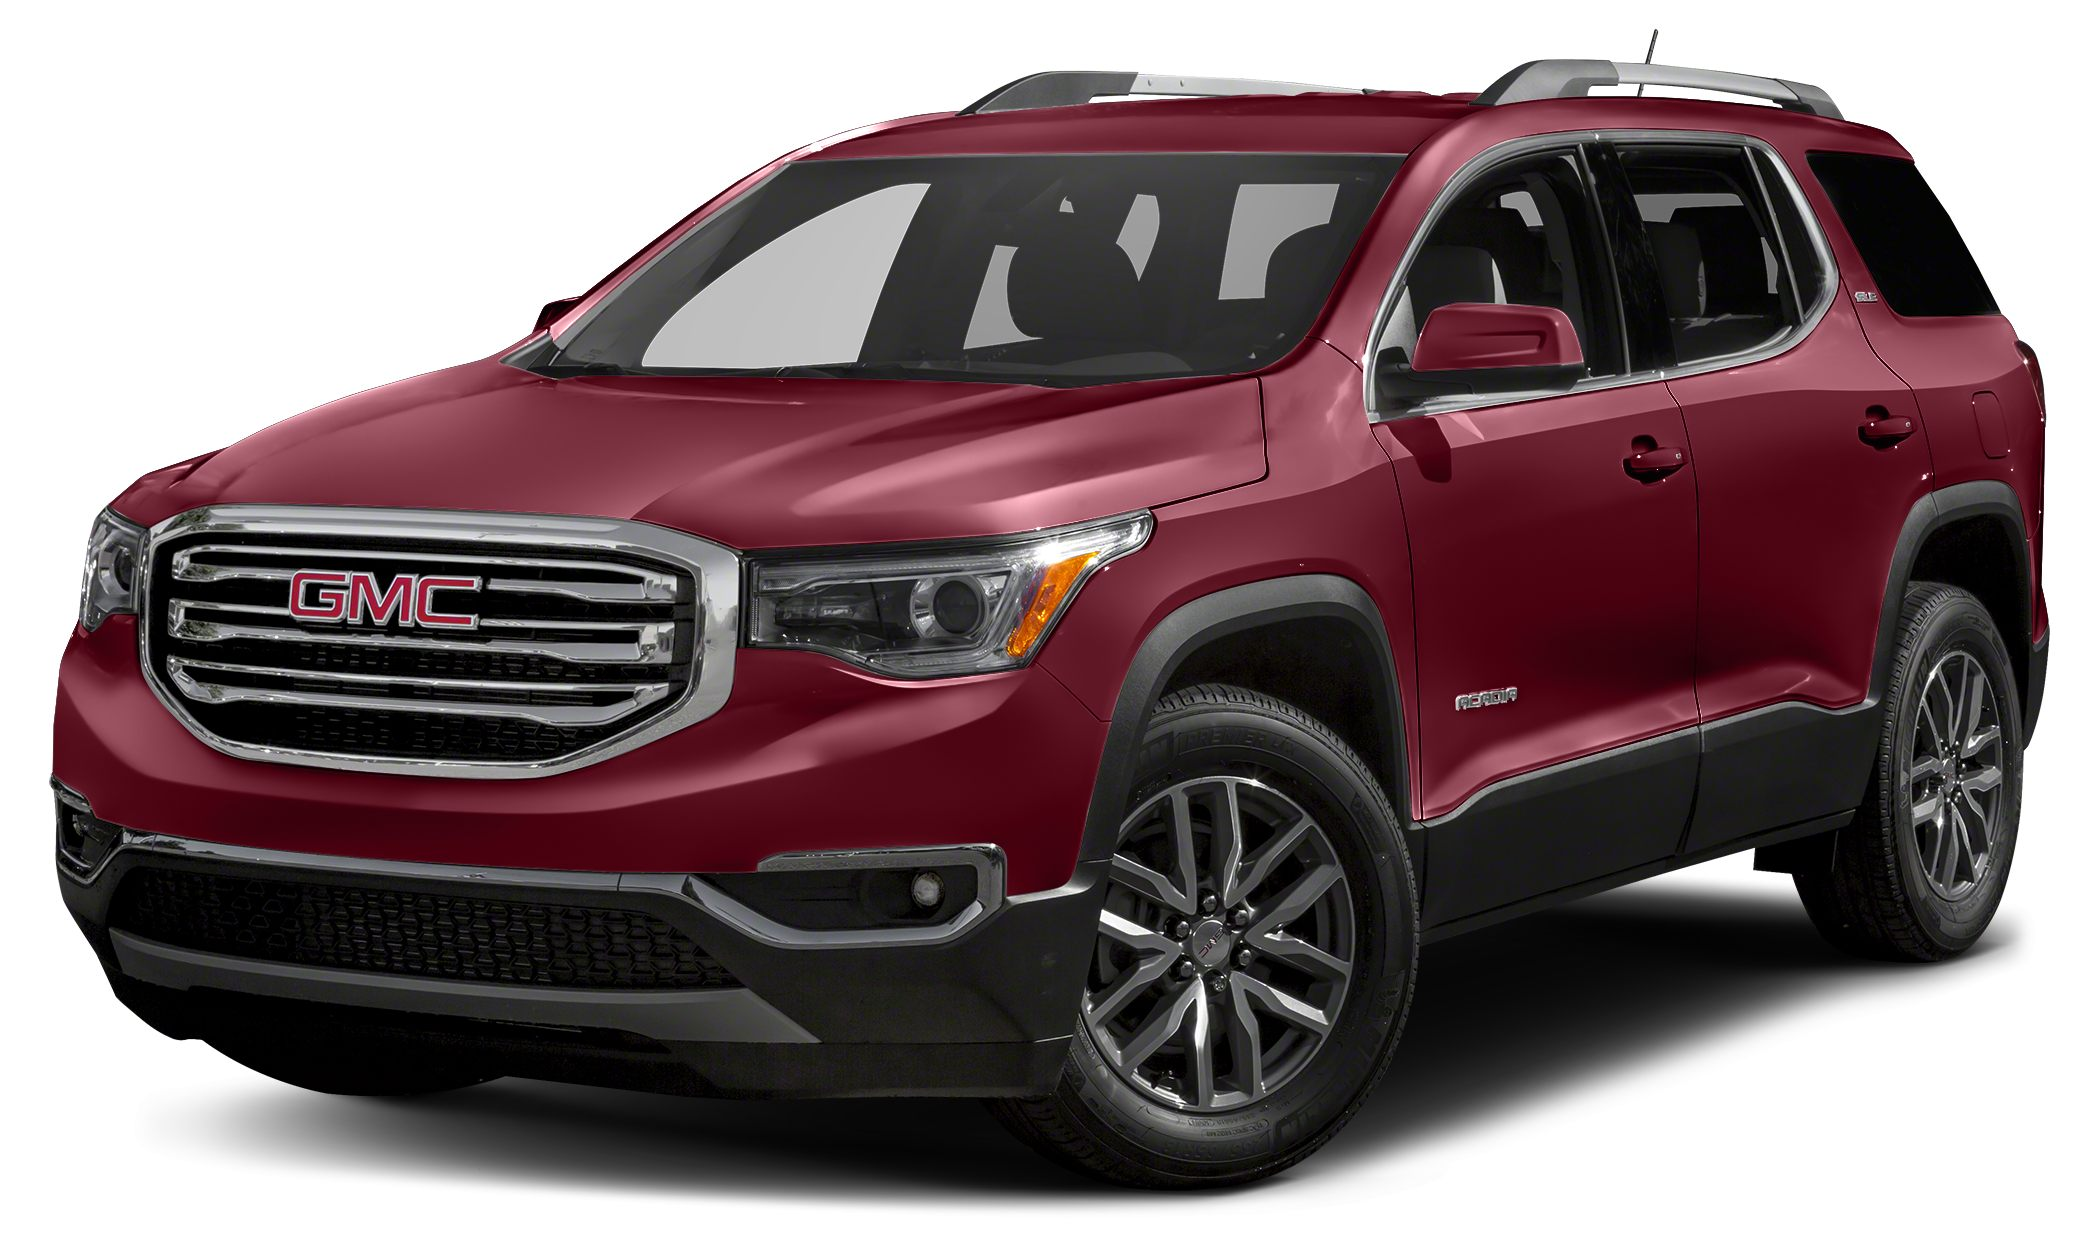 2018 GMC Acadia SLT-1 Miles 0Color Crimson Red Tintcoat Stock 106442 VIN 1GKKNMLS1JZ106442